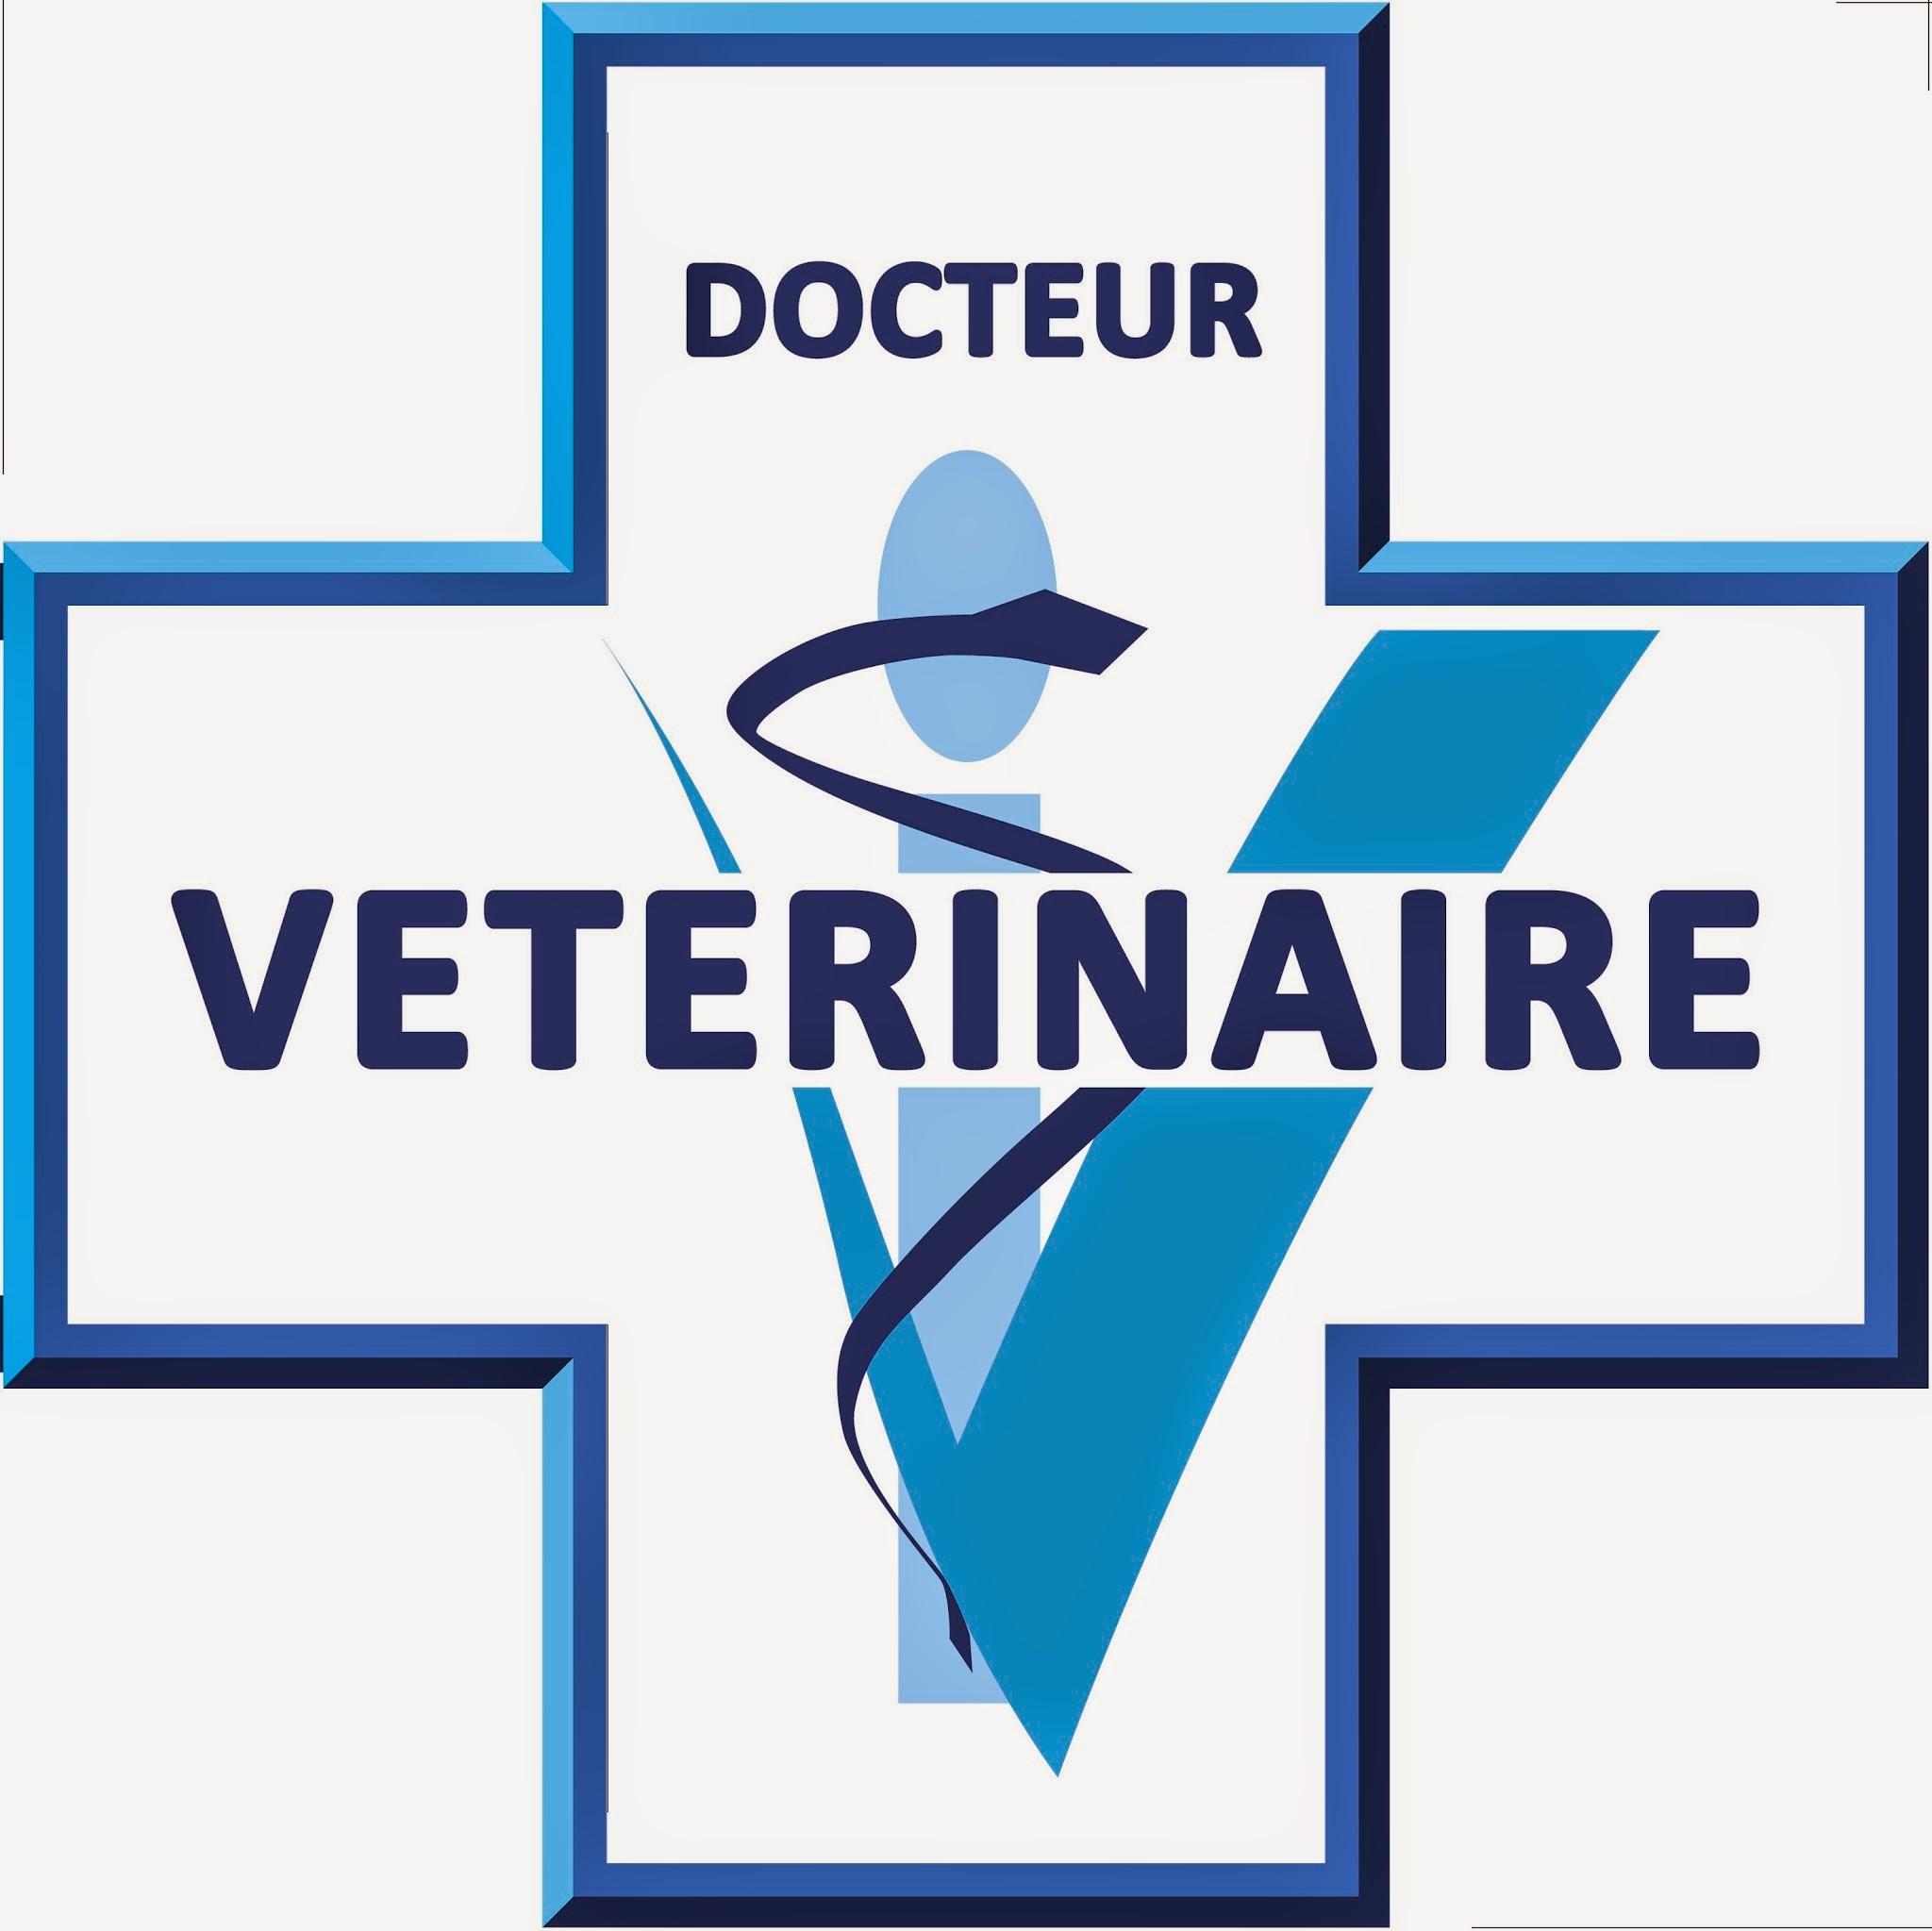 Site de rencontre veterinaire